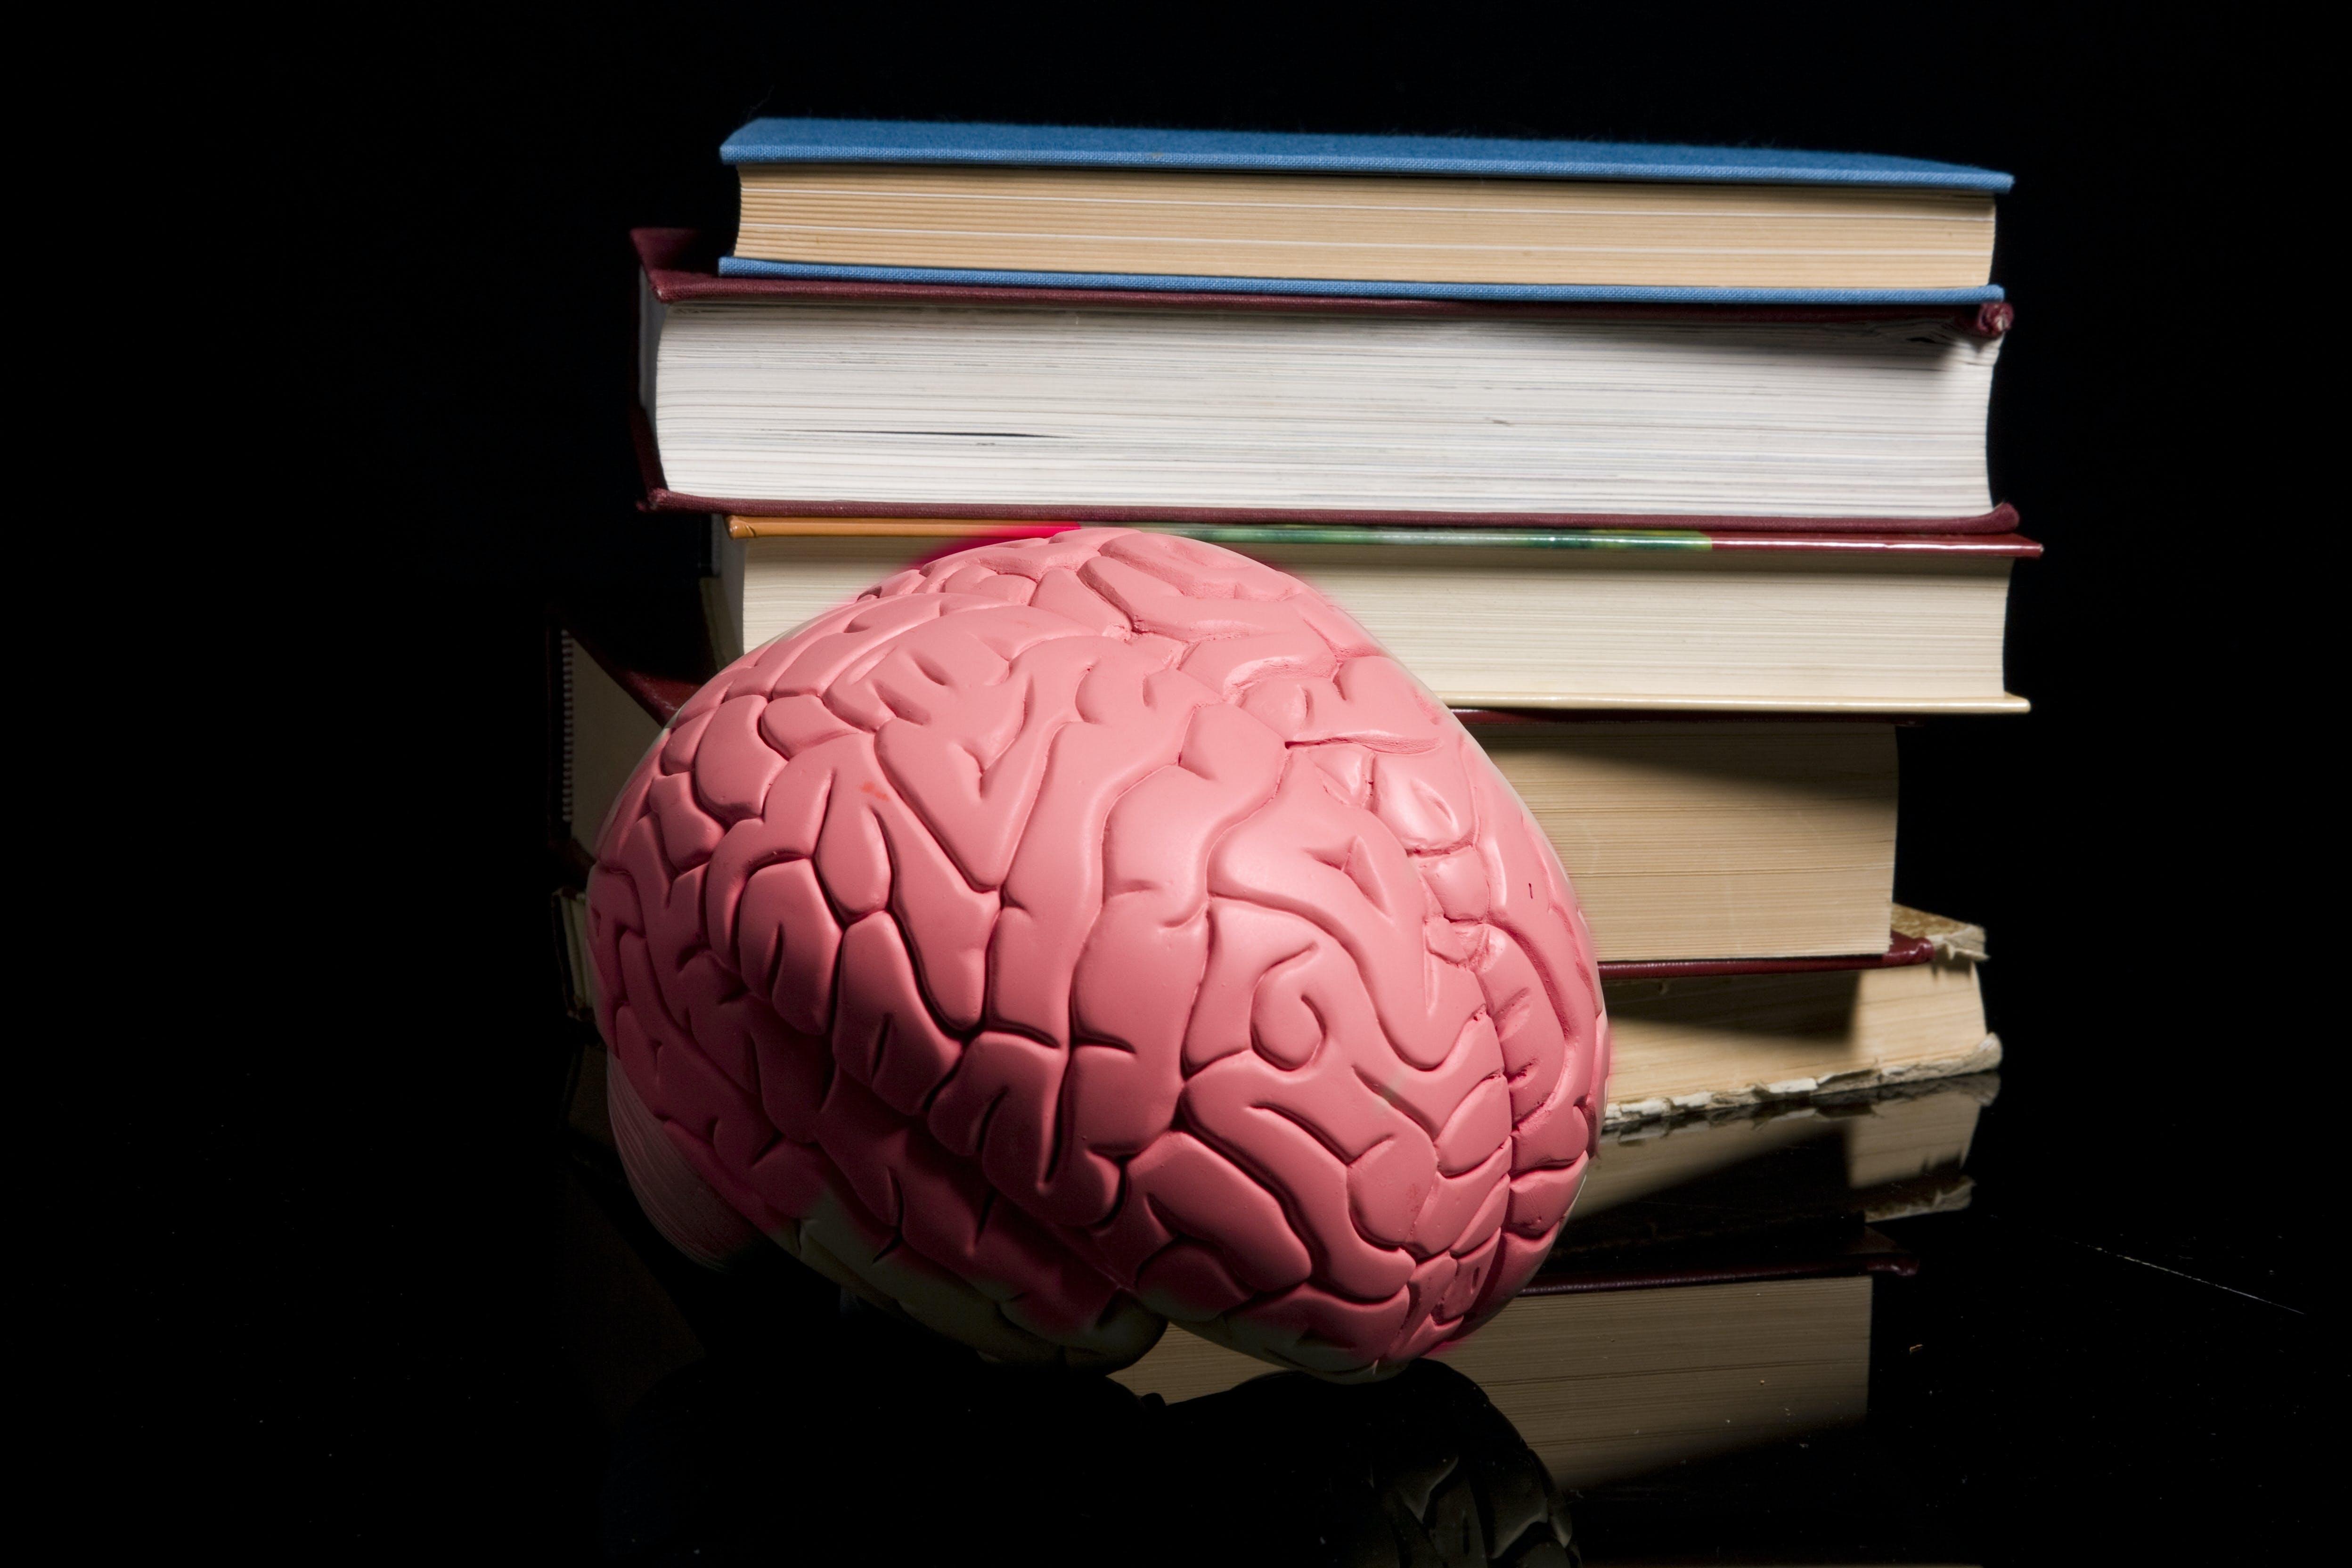 Brain and books